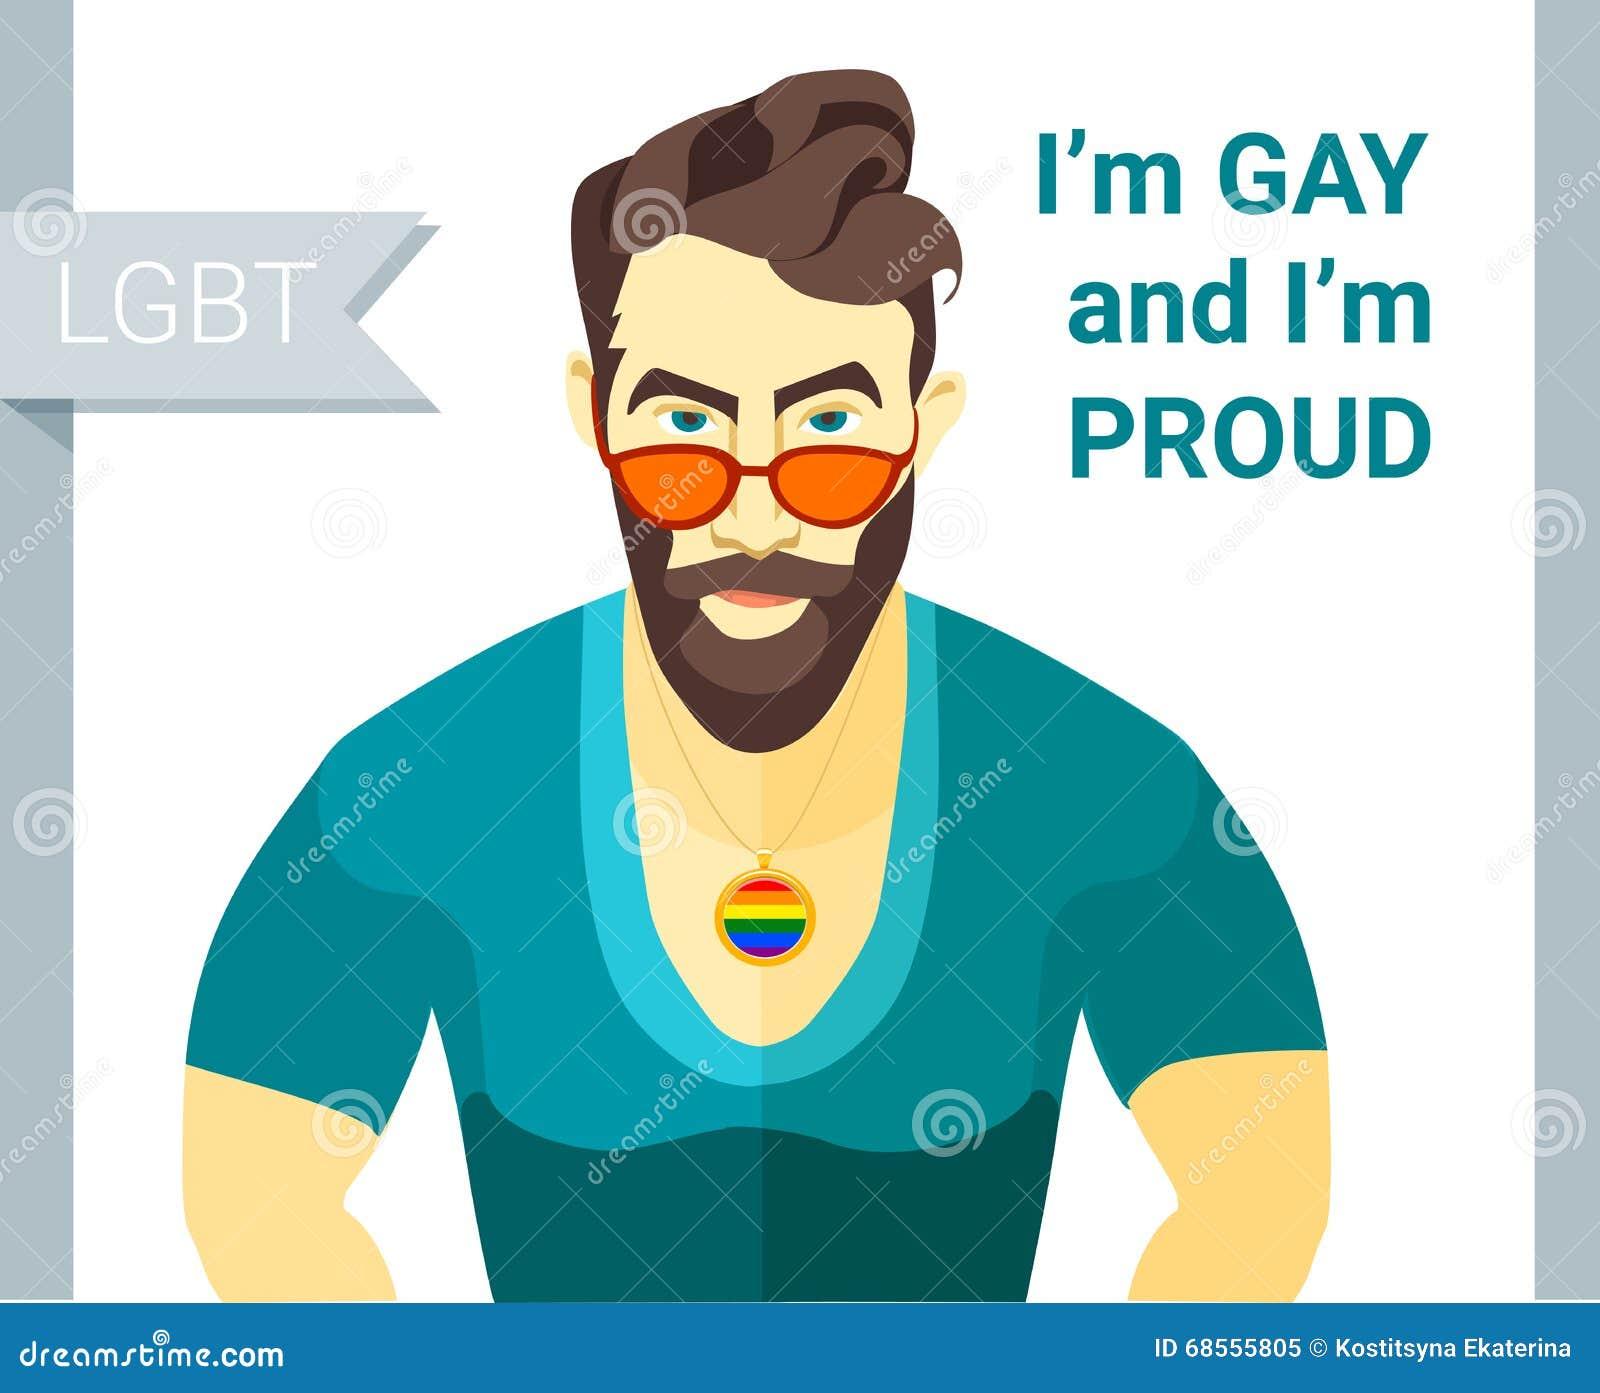 gay pride illustration